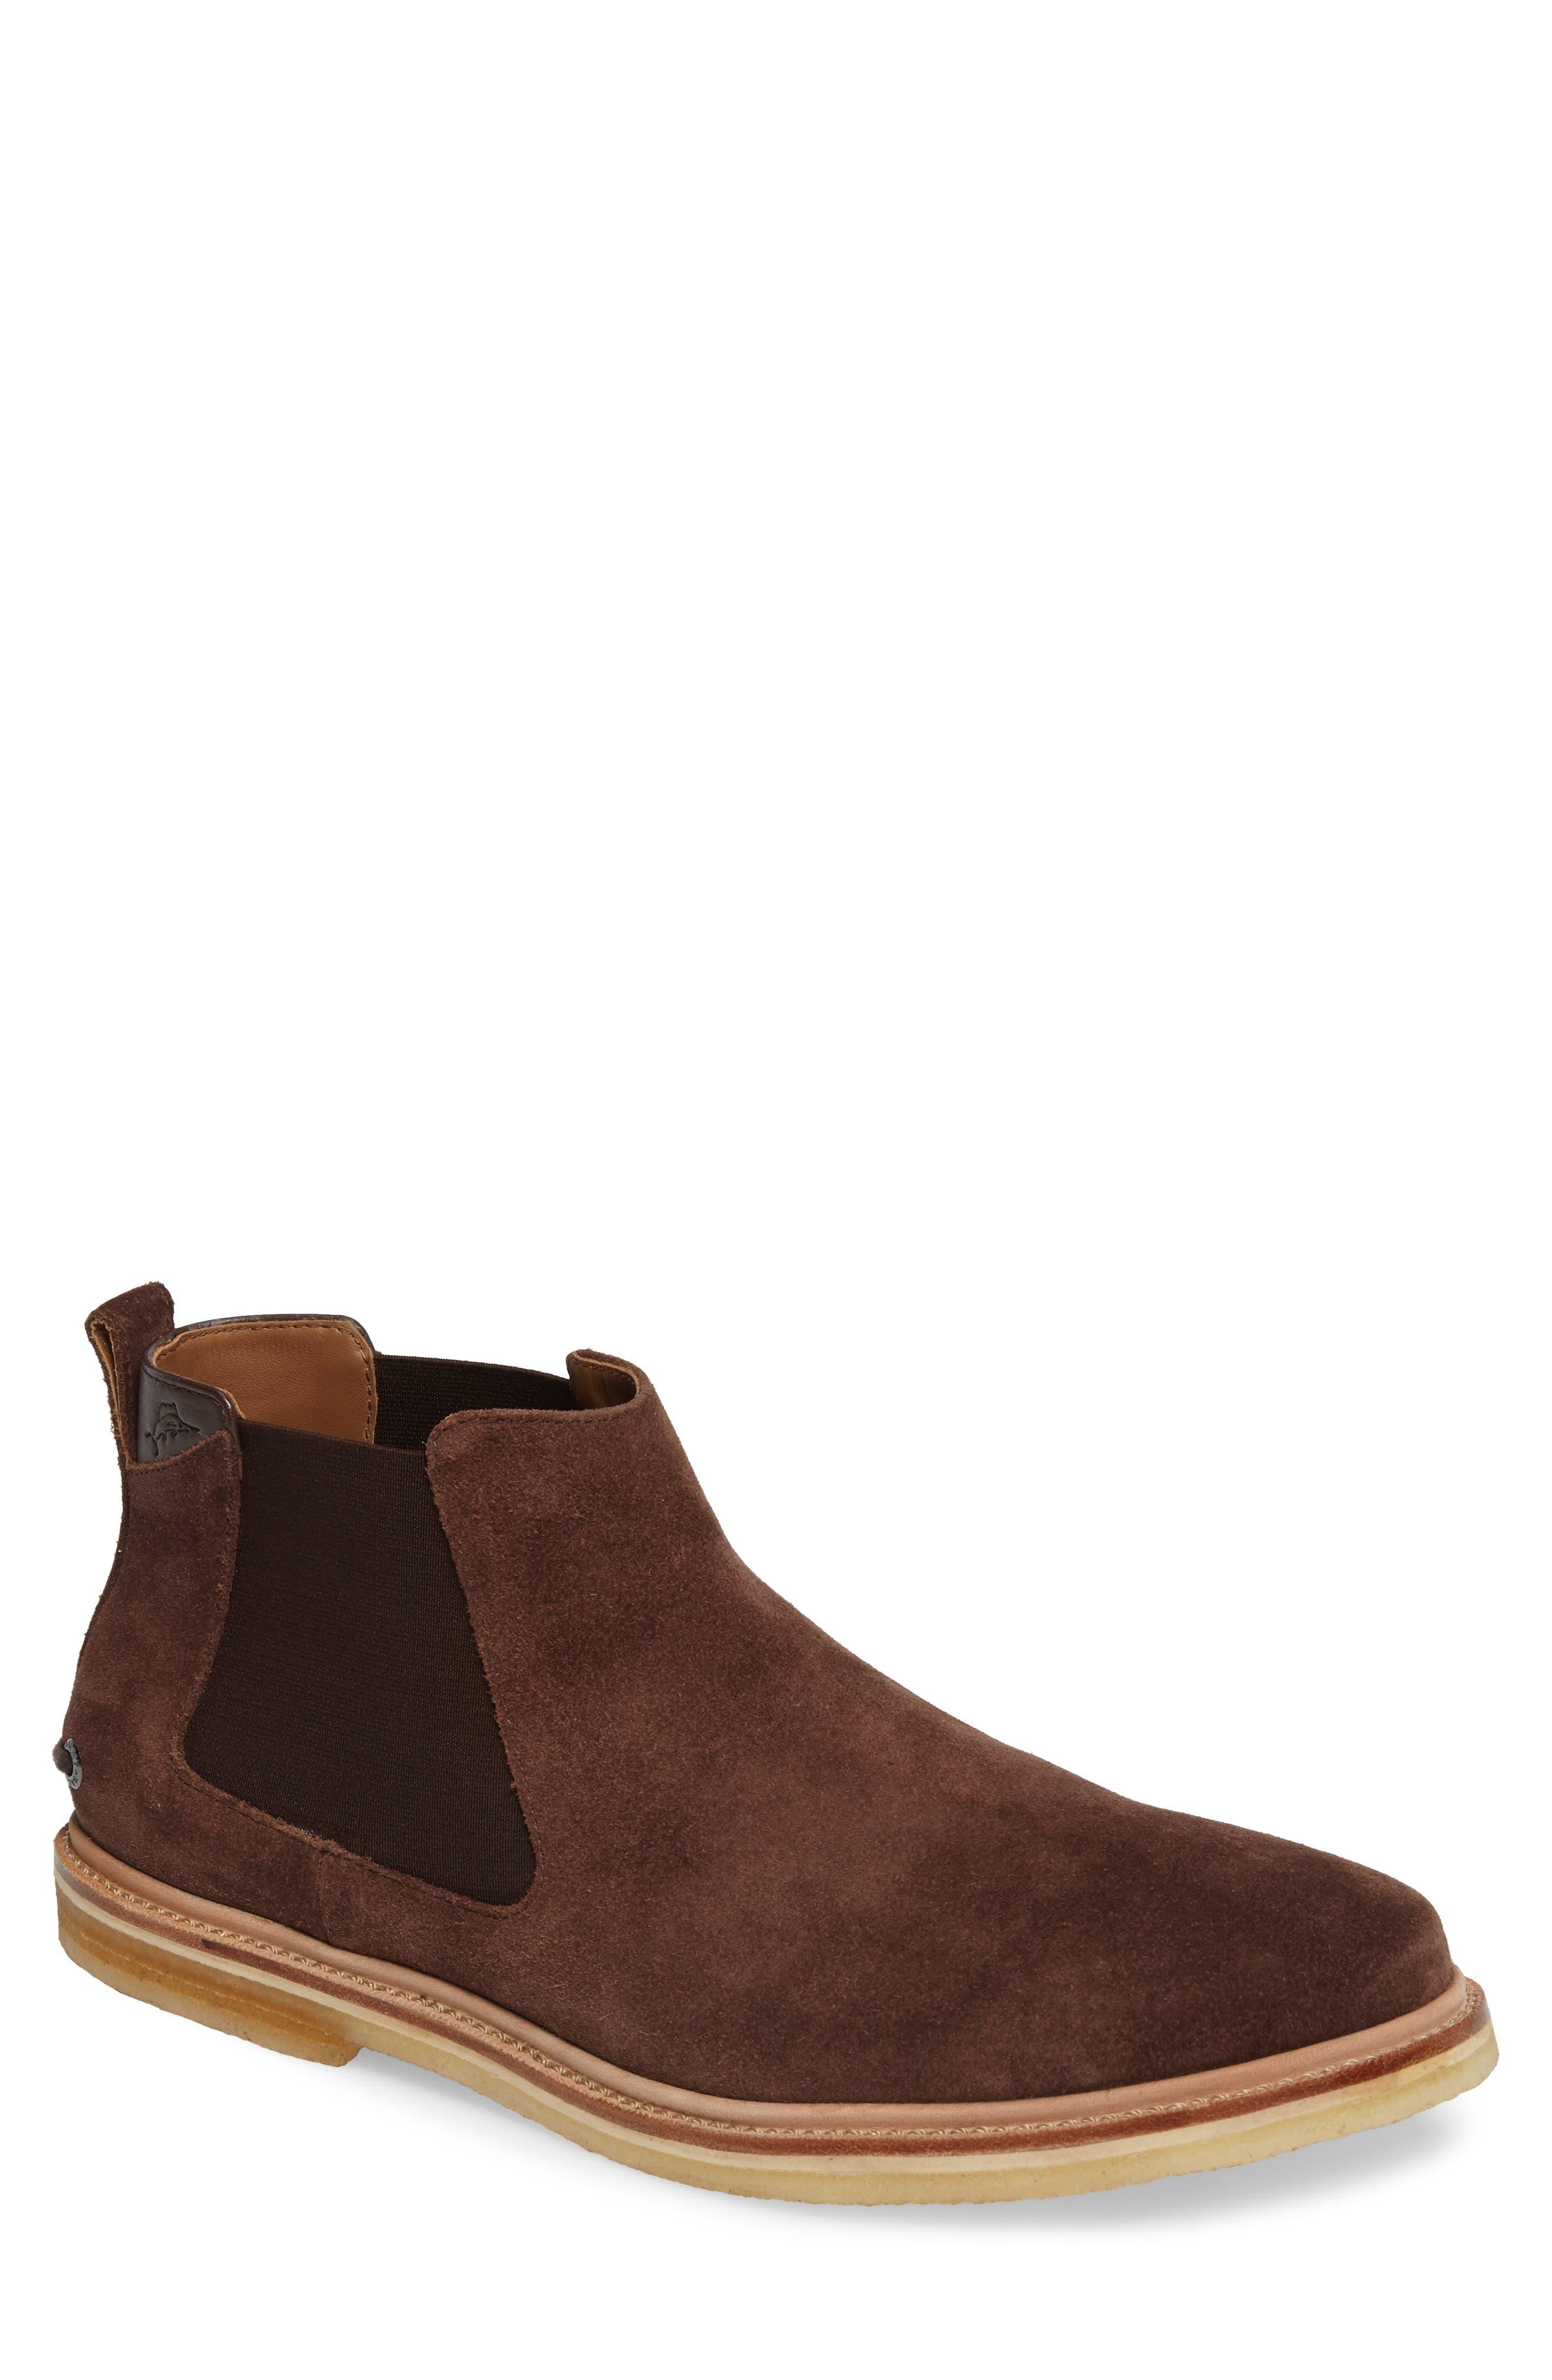 Legzira Beach Chelsea Boot,                         Main,                         color, Brown Suede